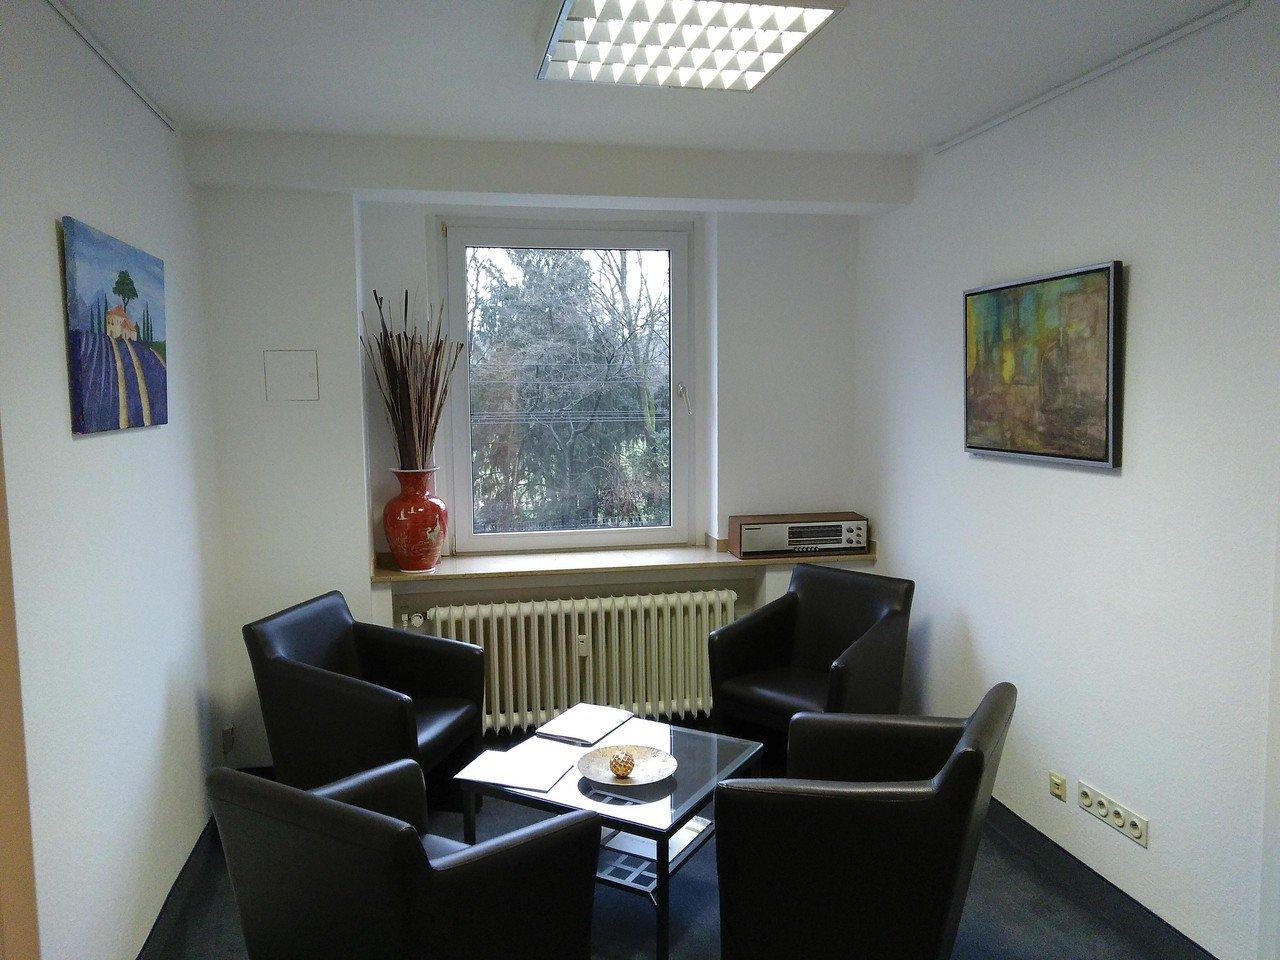 Düsseldorf  Salle de réunion Room Robert image 3